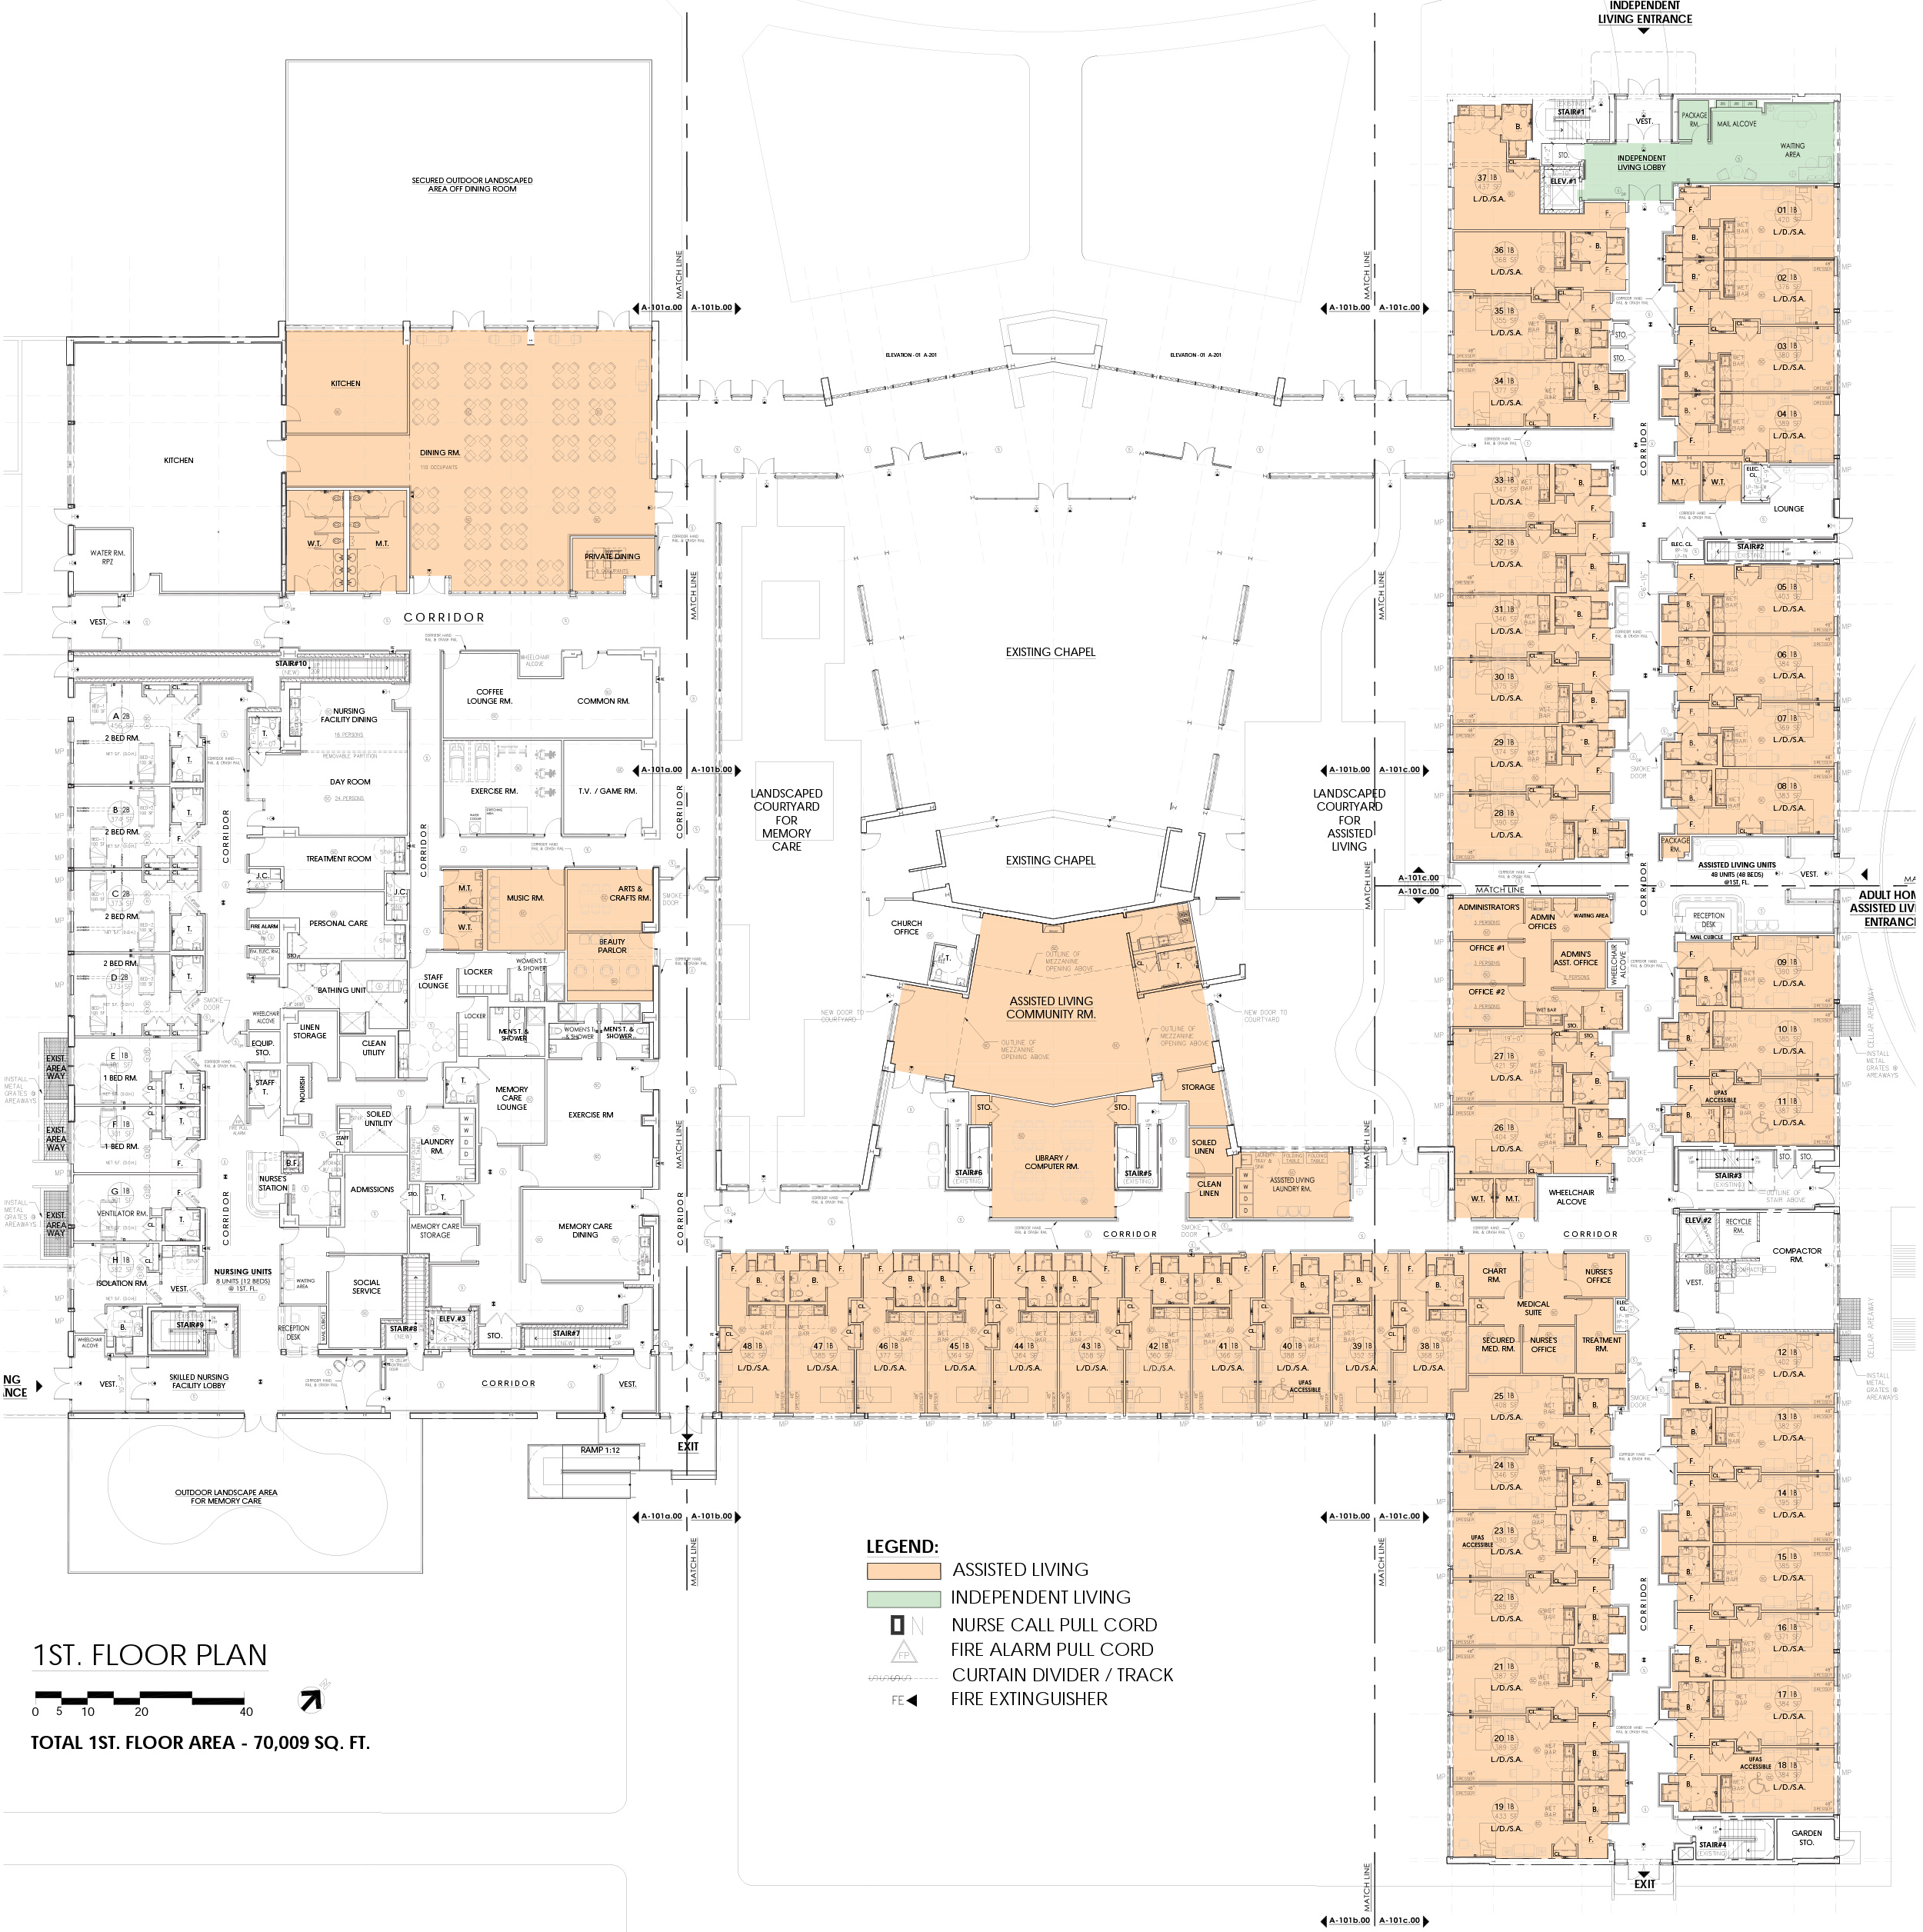 01_1st_floor_plan_entire.jpg